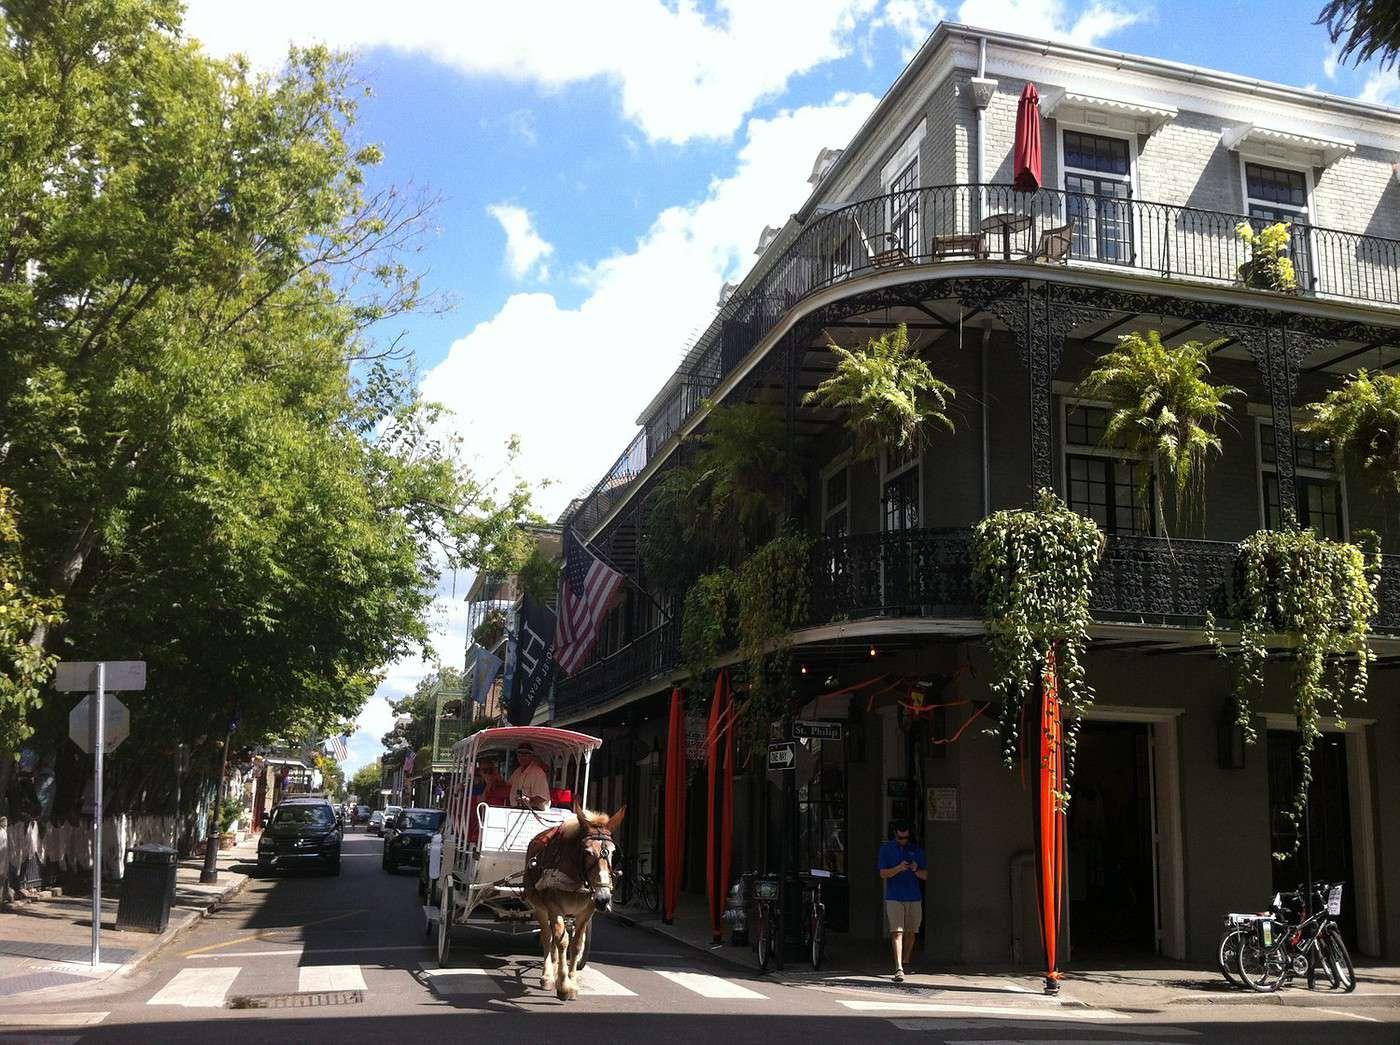 De Vegas à Key West 7 000 Km En Harley Carnet De Voyage